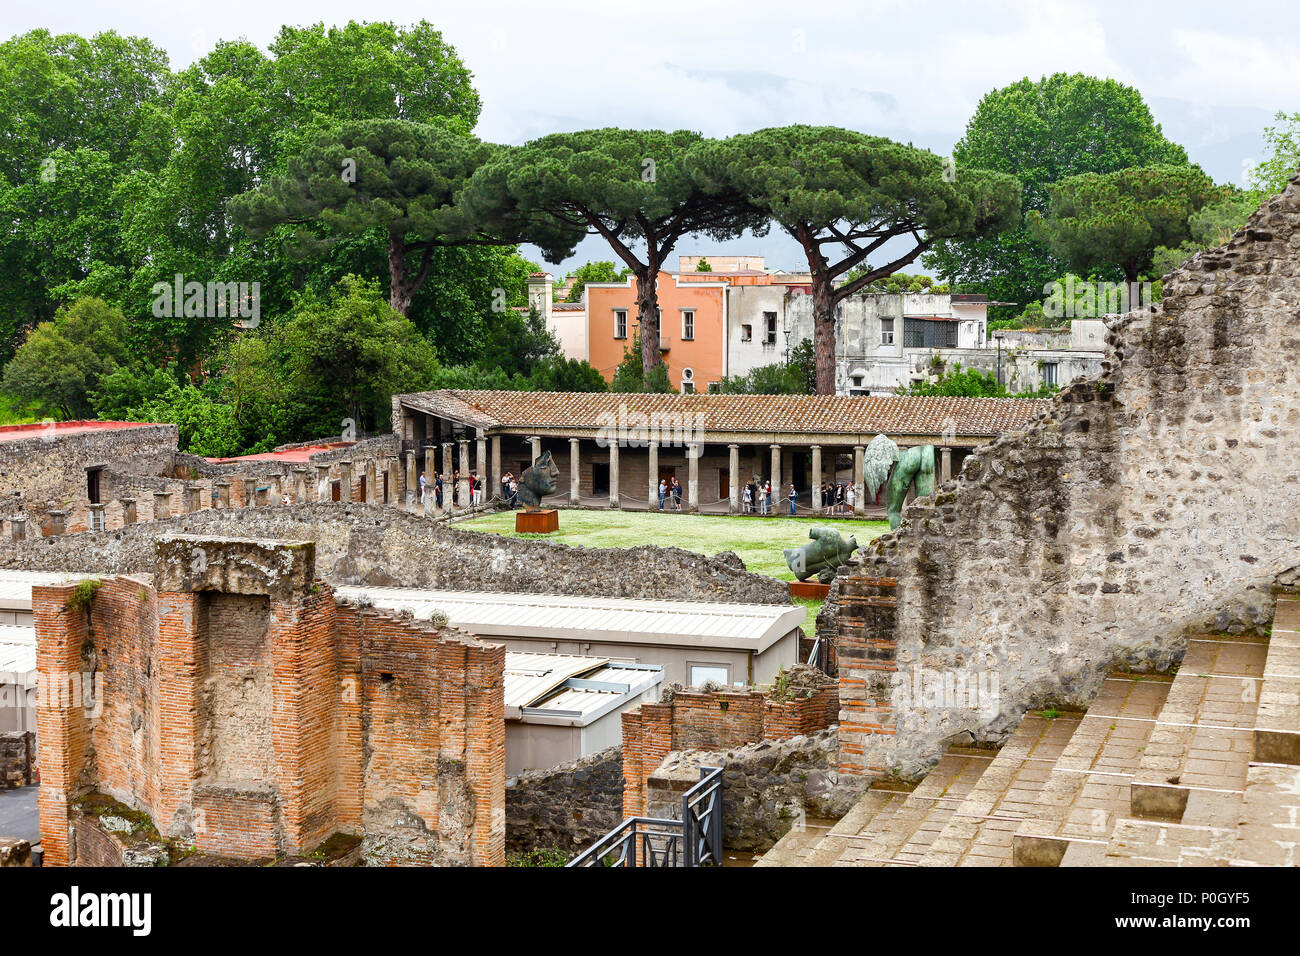 Pompeii Archaeological site, Pompeii, Campania, Italy, - Stock Image